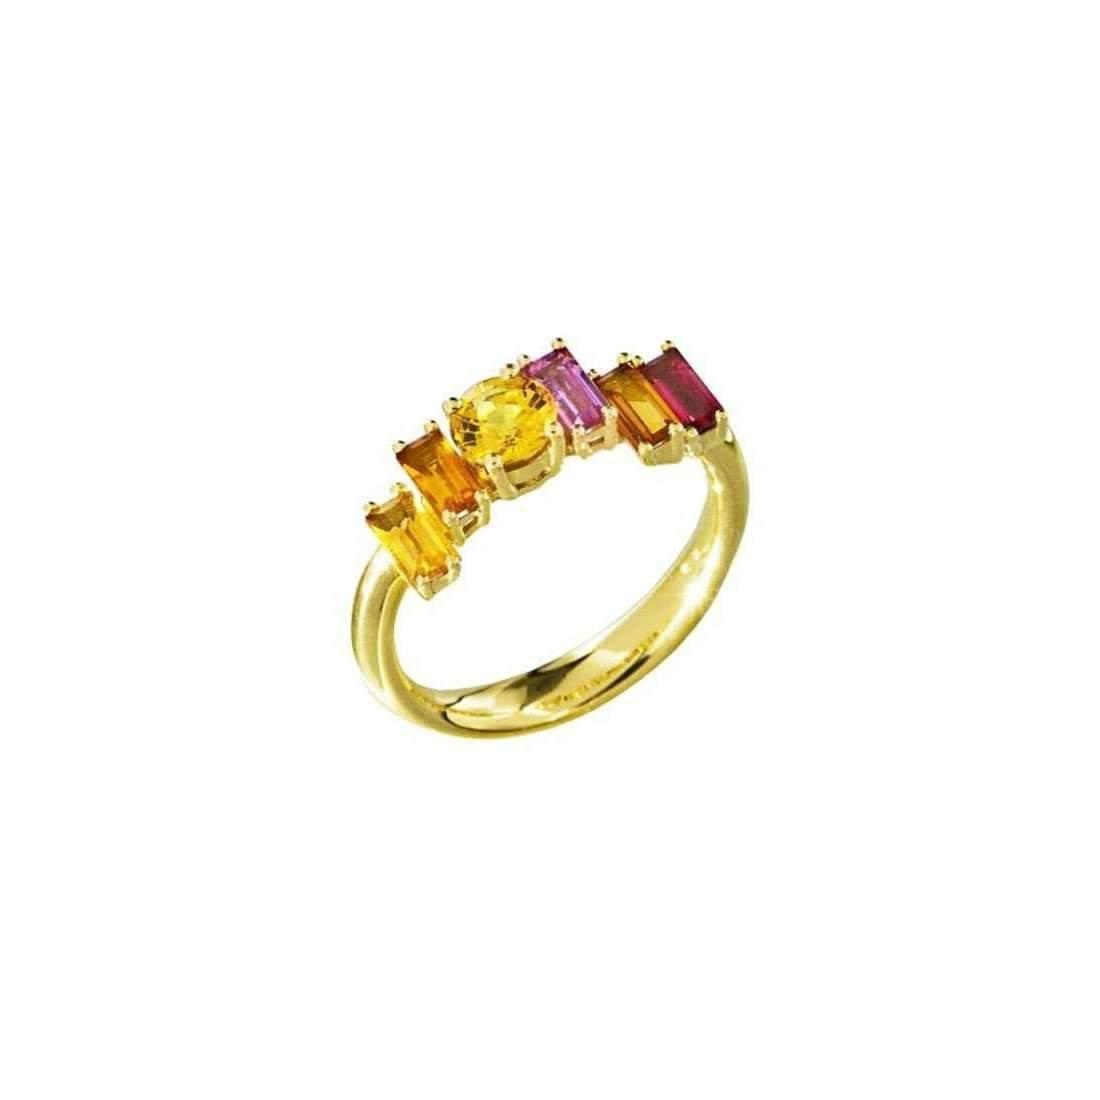 Daou Jewellery 18kt White Gold, Pearl & Topaz Morning Light Ring - UK O - US 7 - EU 55 1/4